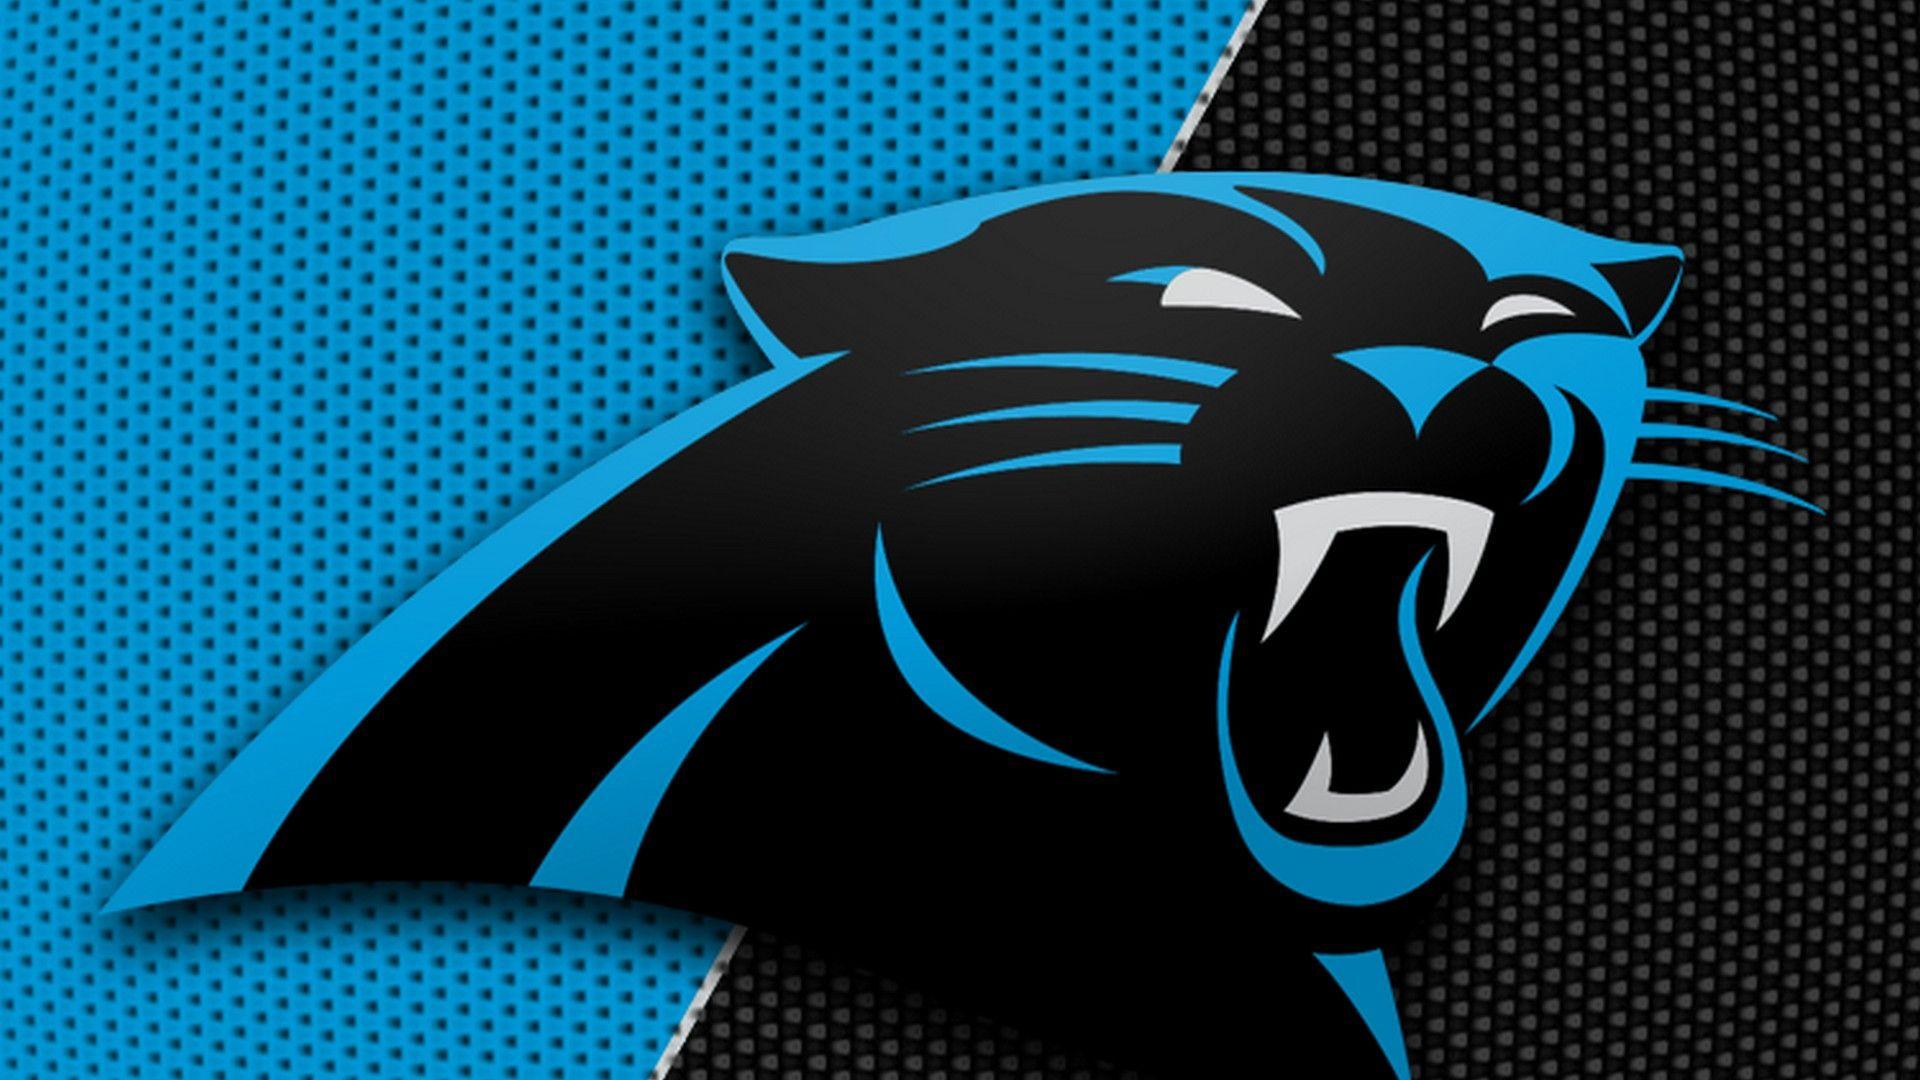 Backgrounds Carolina Panthers Hd 2020 Nfl Football Wallpapers Carolina Panthers Nfl Football Wallpaper Panthers